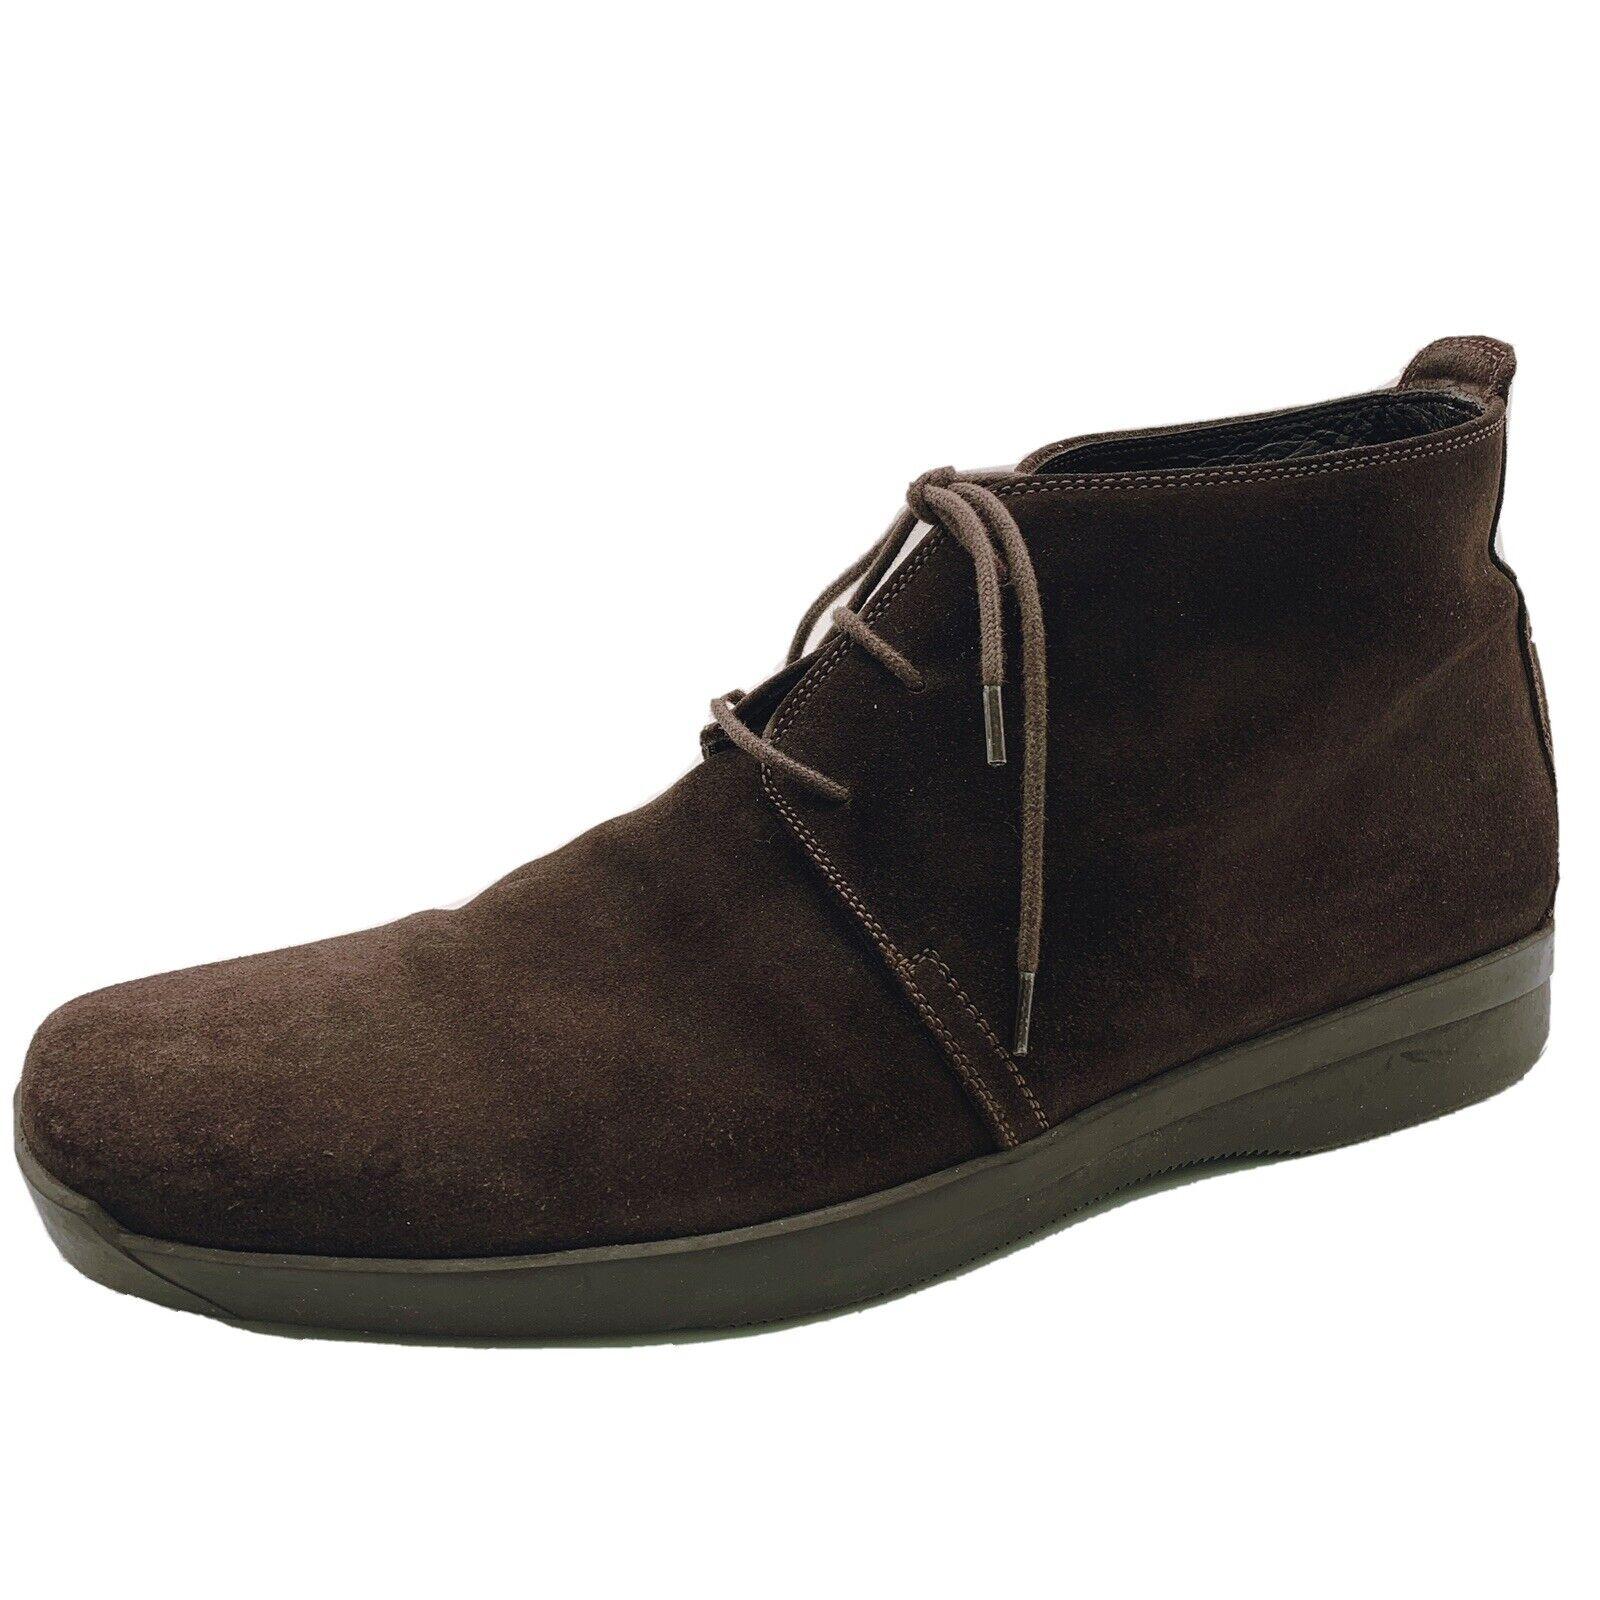 Ermenegildo Zegna Men's Brown Chukka Boots Suede 8 Made in Italy